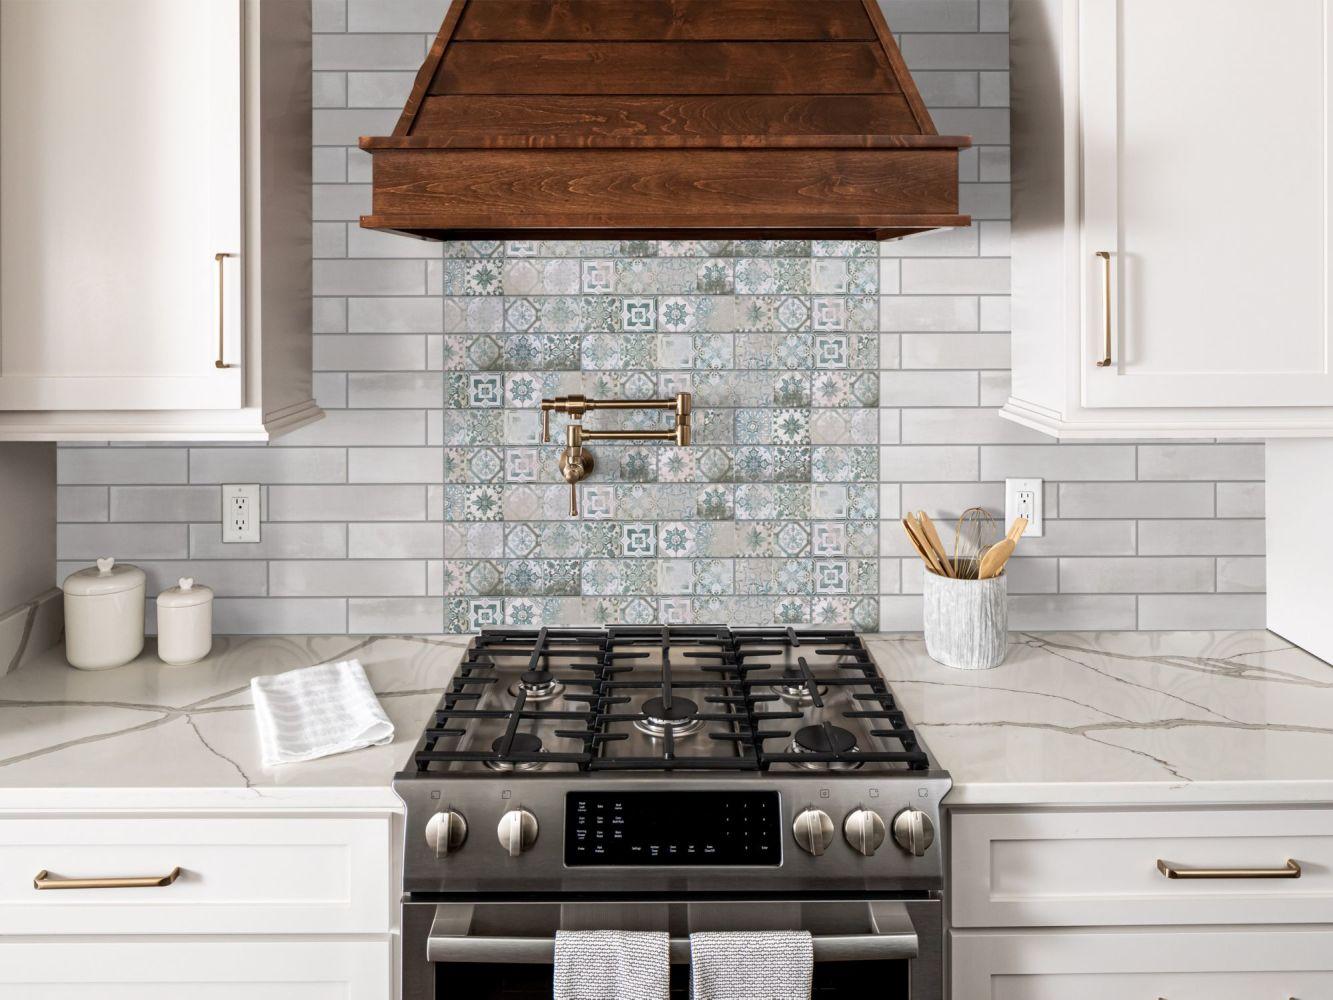 Shaw Floors Ceramic Solutions Castello 2.5 X 11 White 00100_310TS